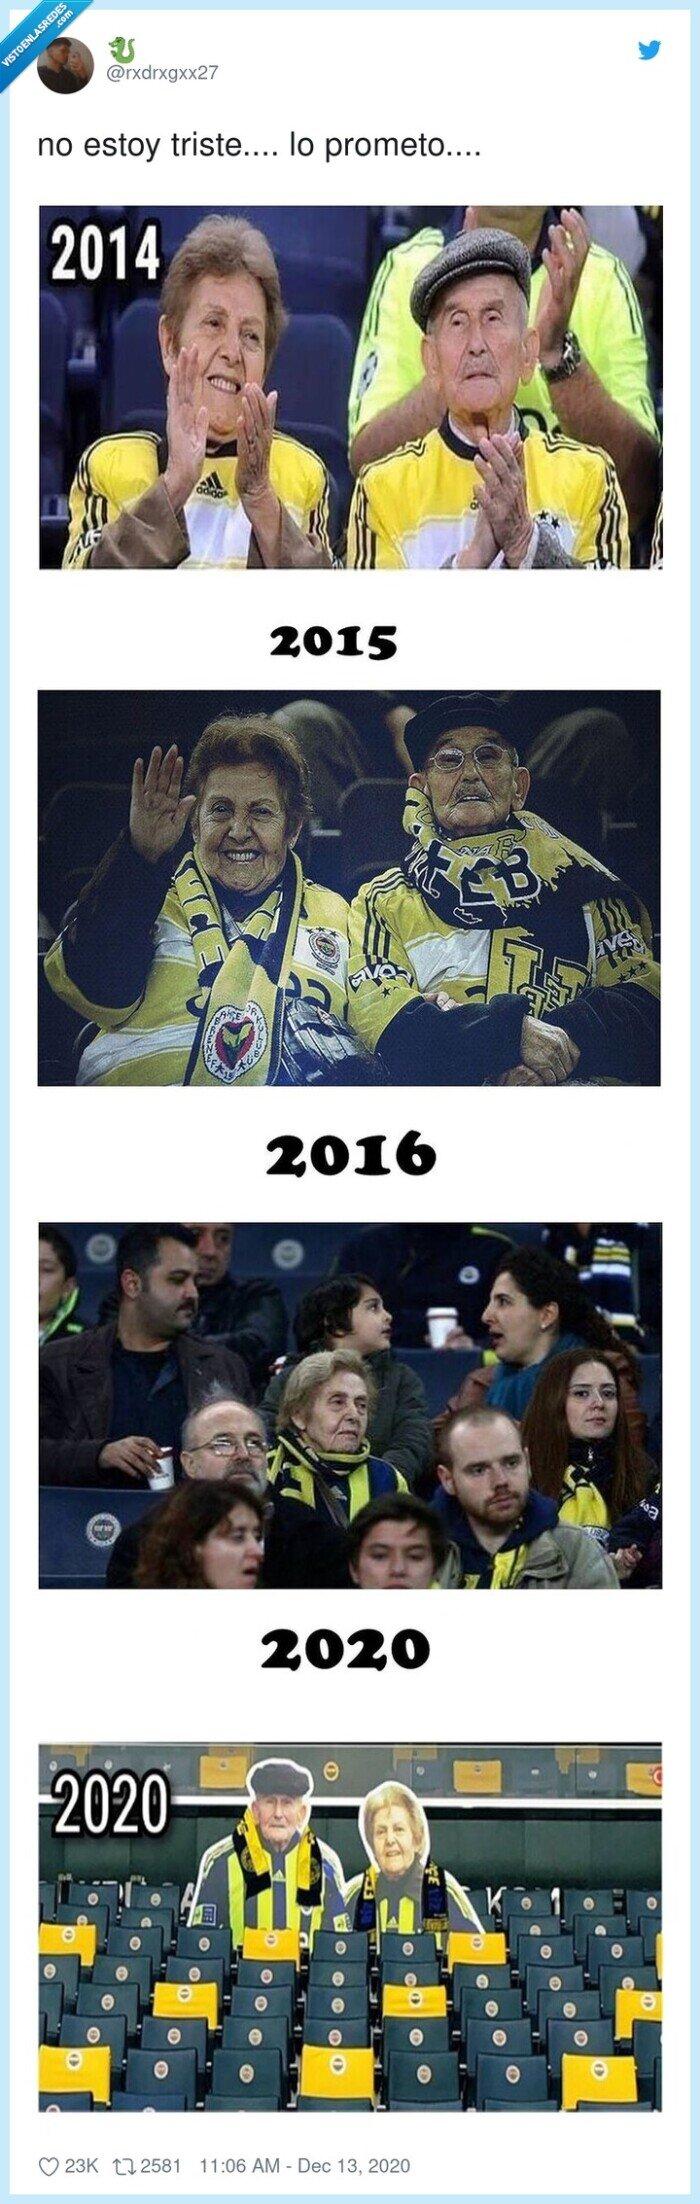 2020,ancianos,dep,futbol,pareja,rip